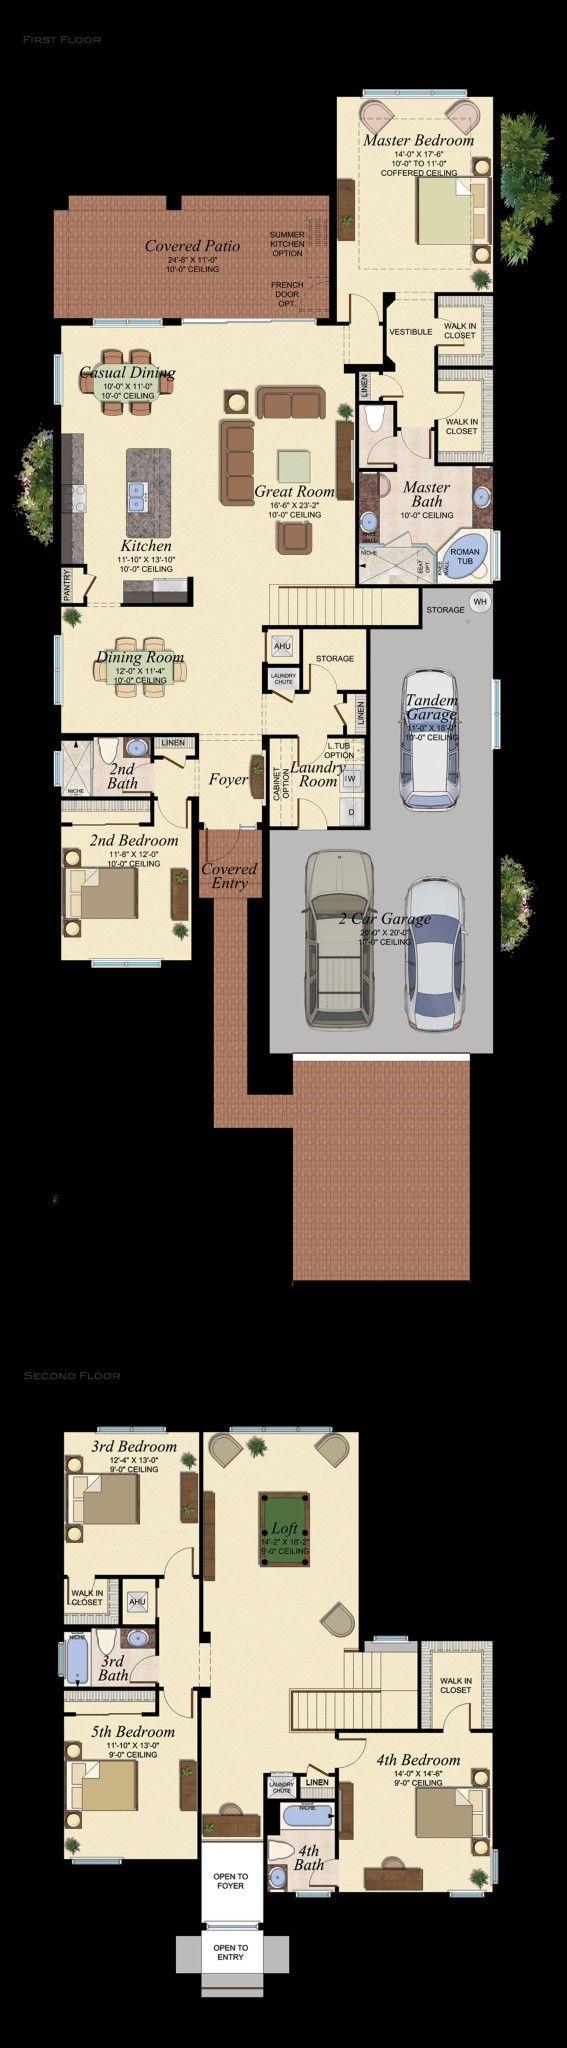 Rose 554 House Plan House Blueprints House Plans Floor Plans